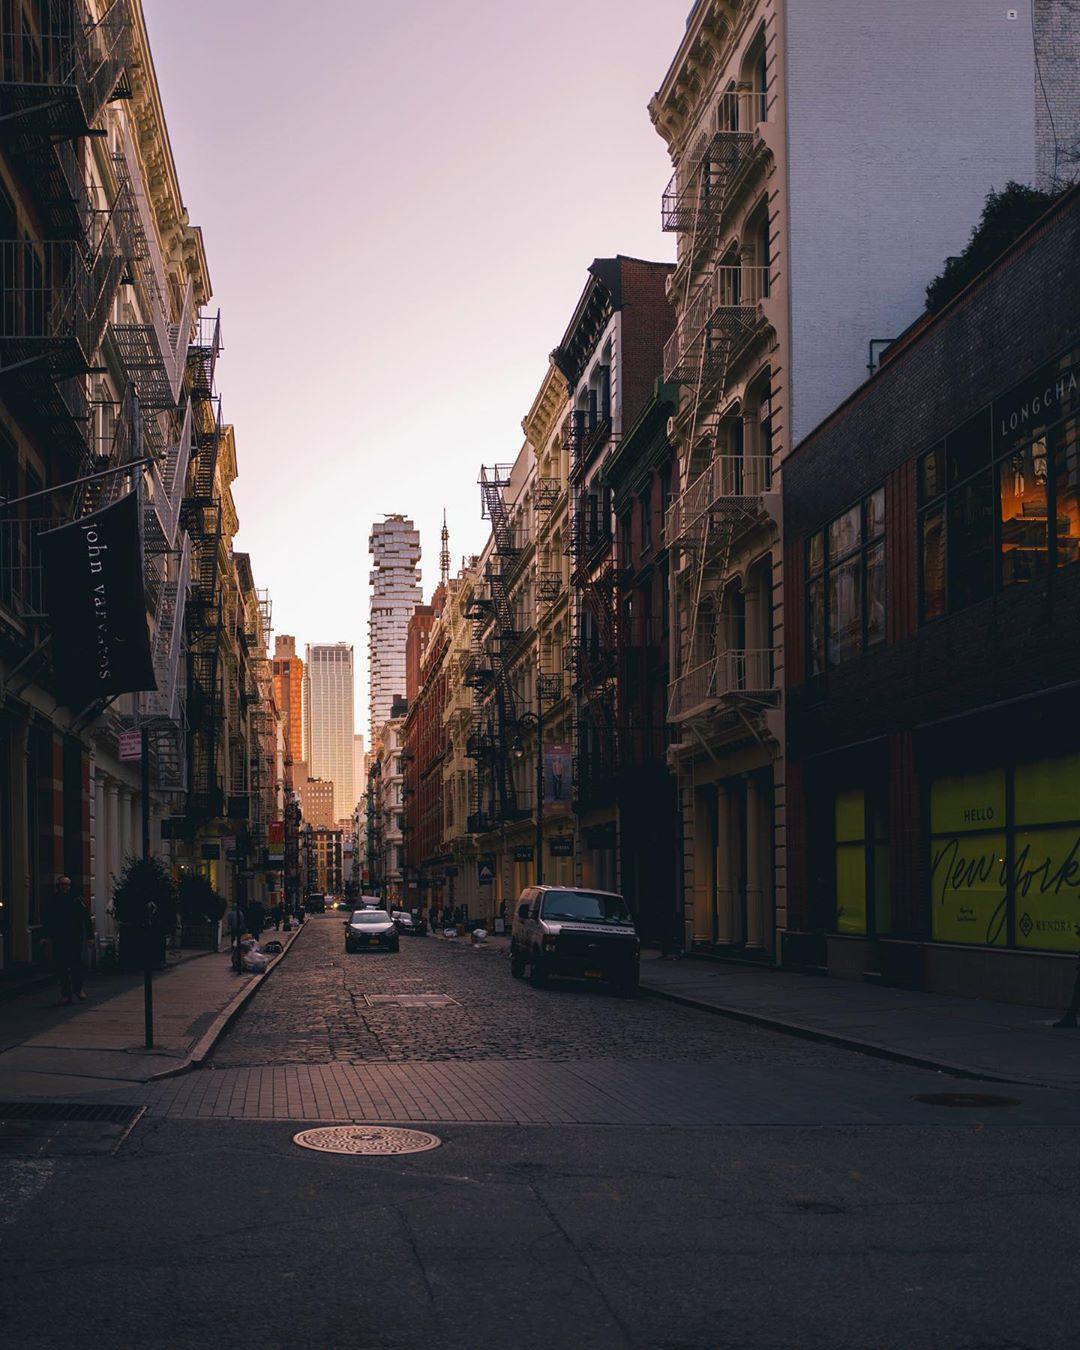 Места и путешествия на снимках Сэма Хорина